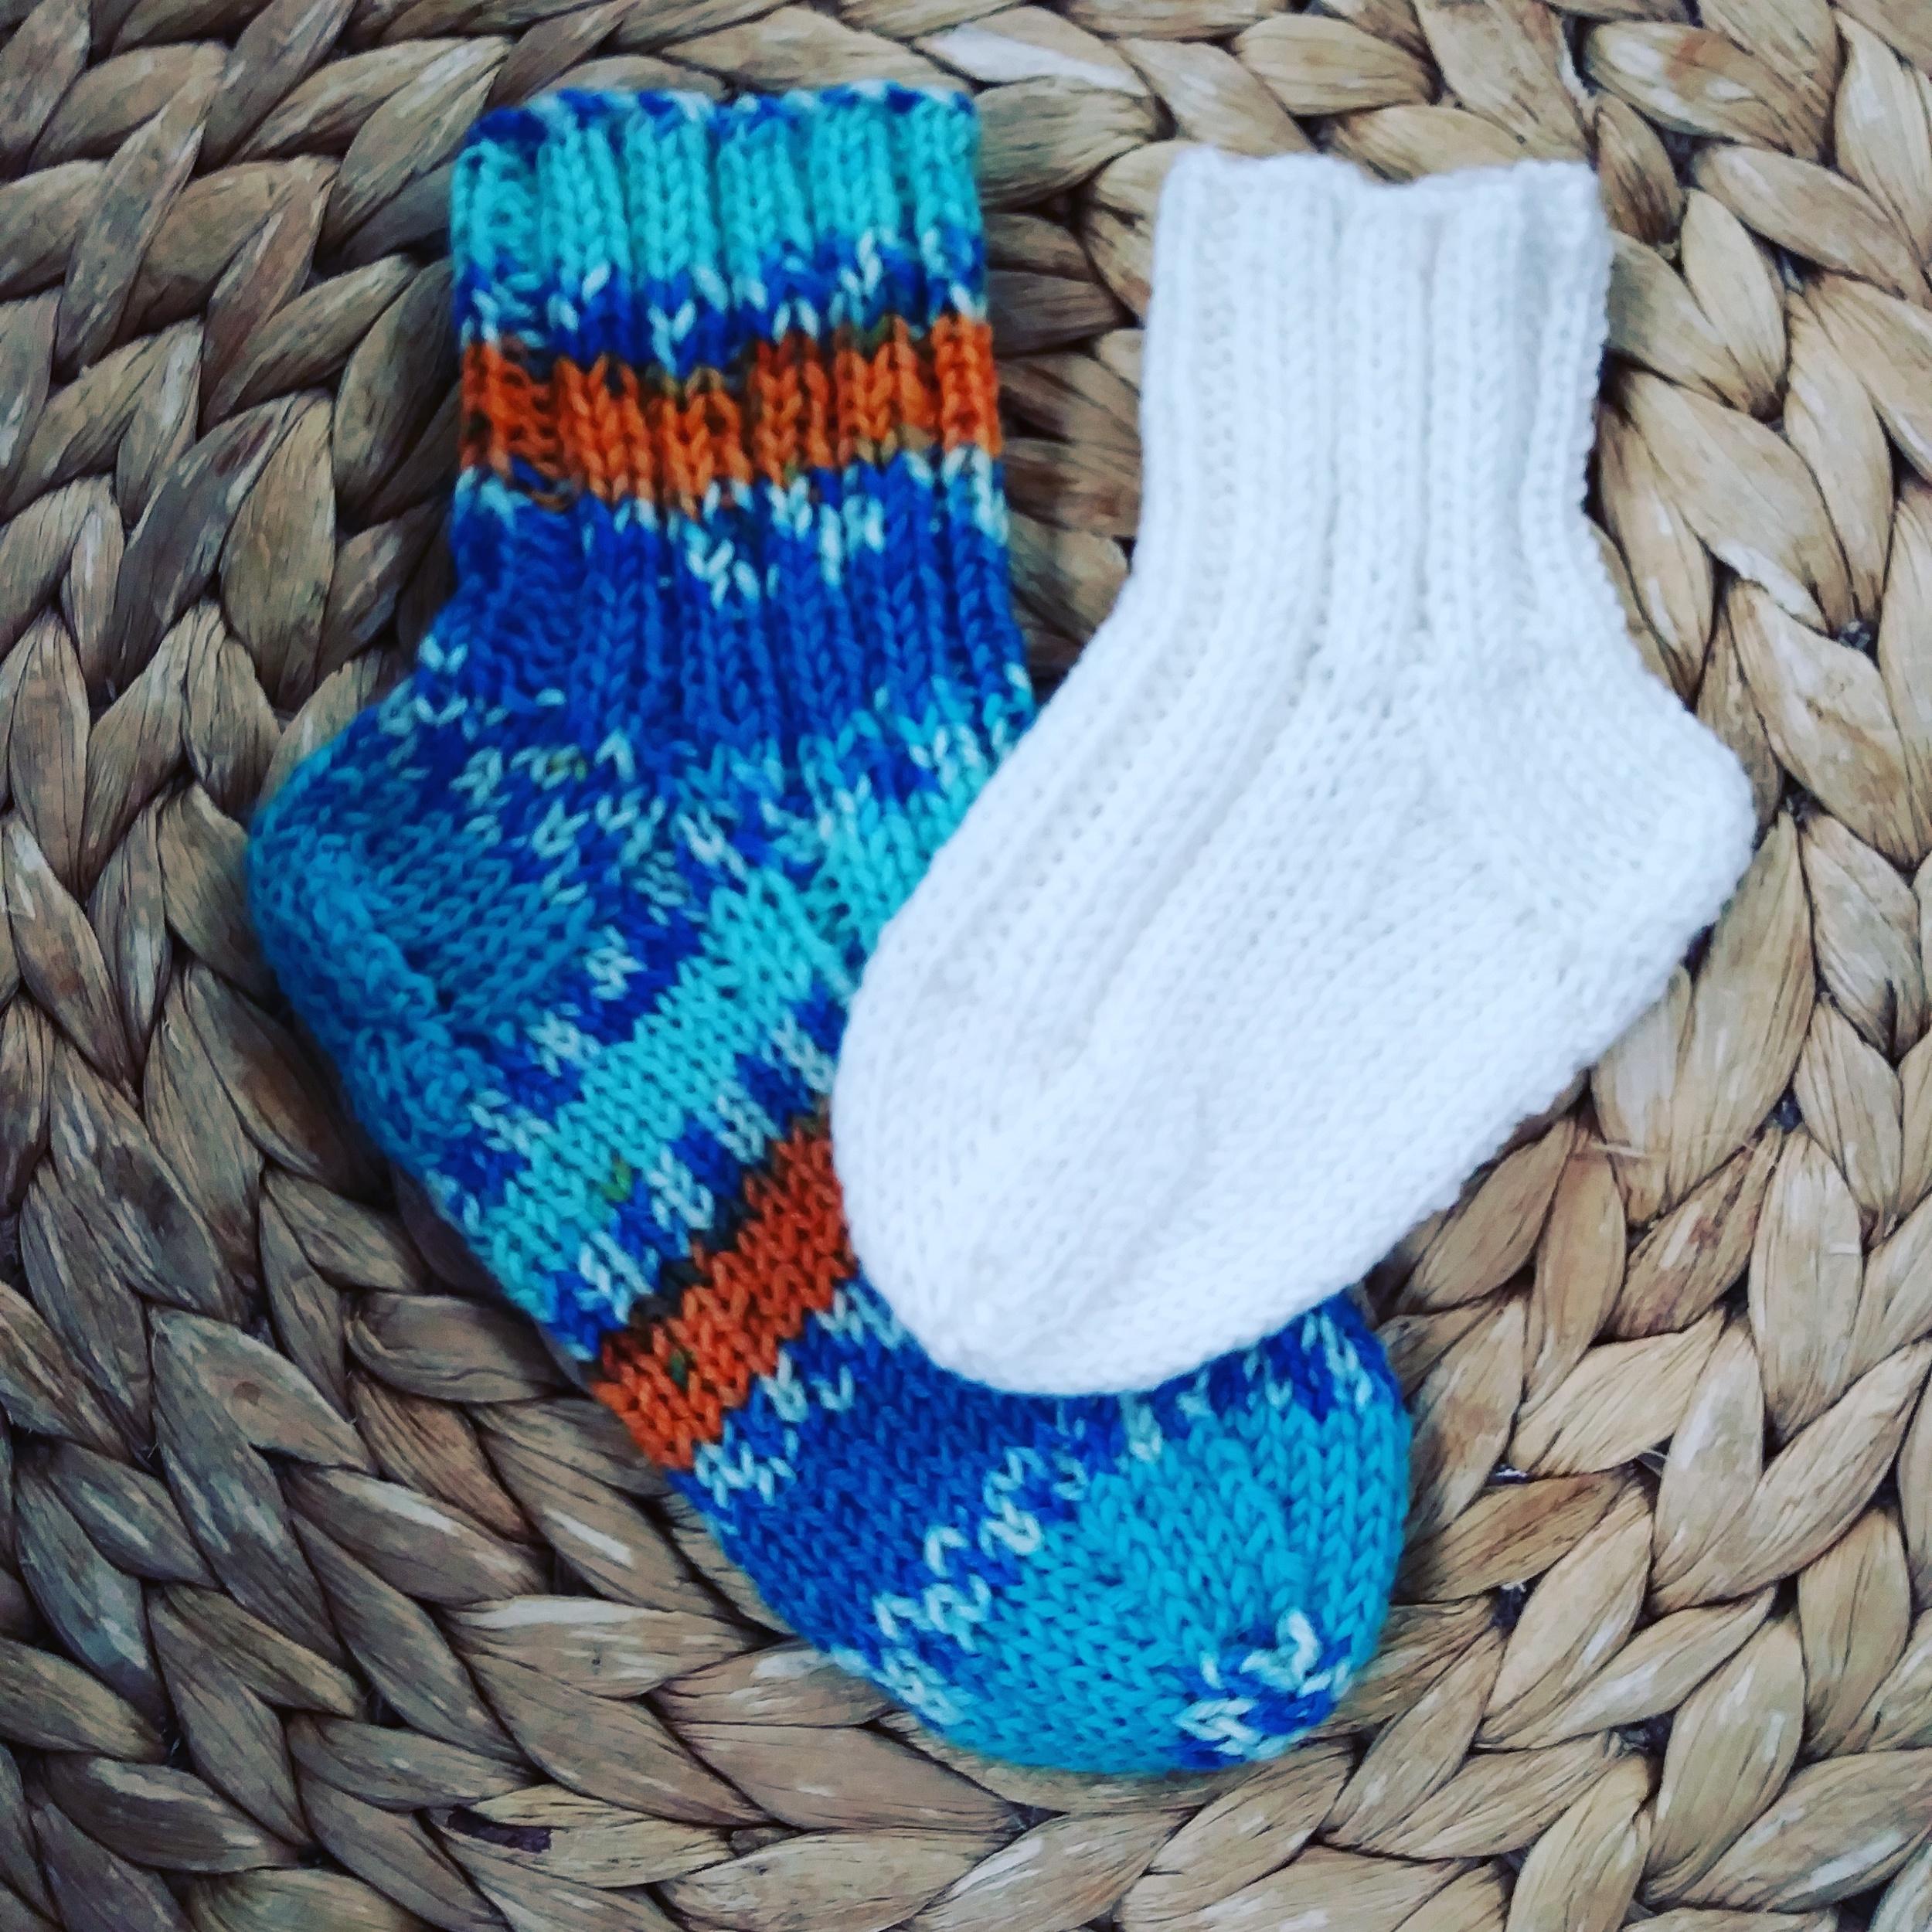 Baby's First Socks By Jane Ellison